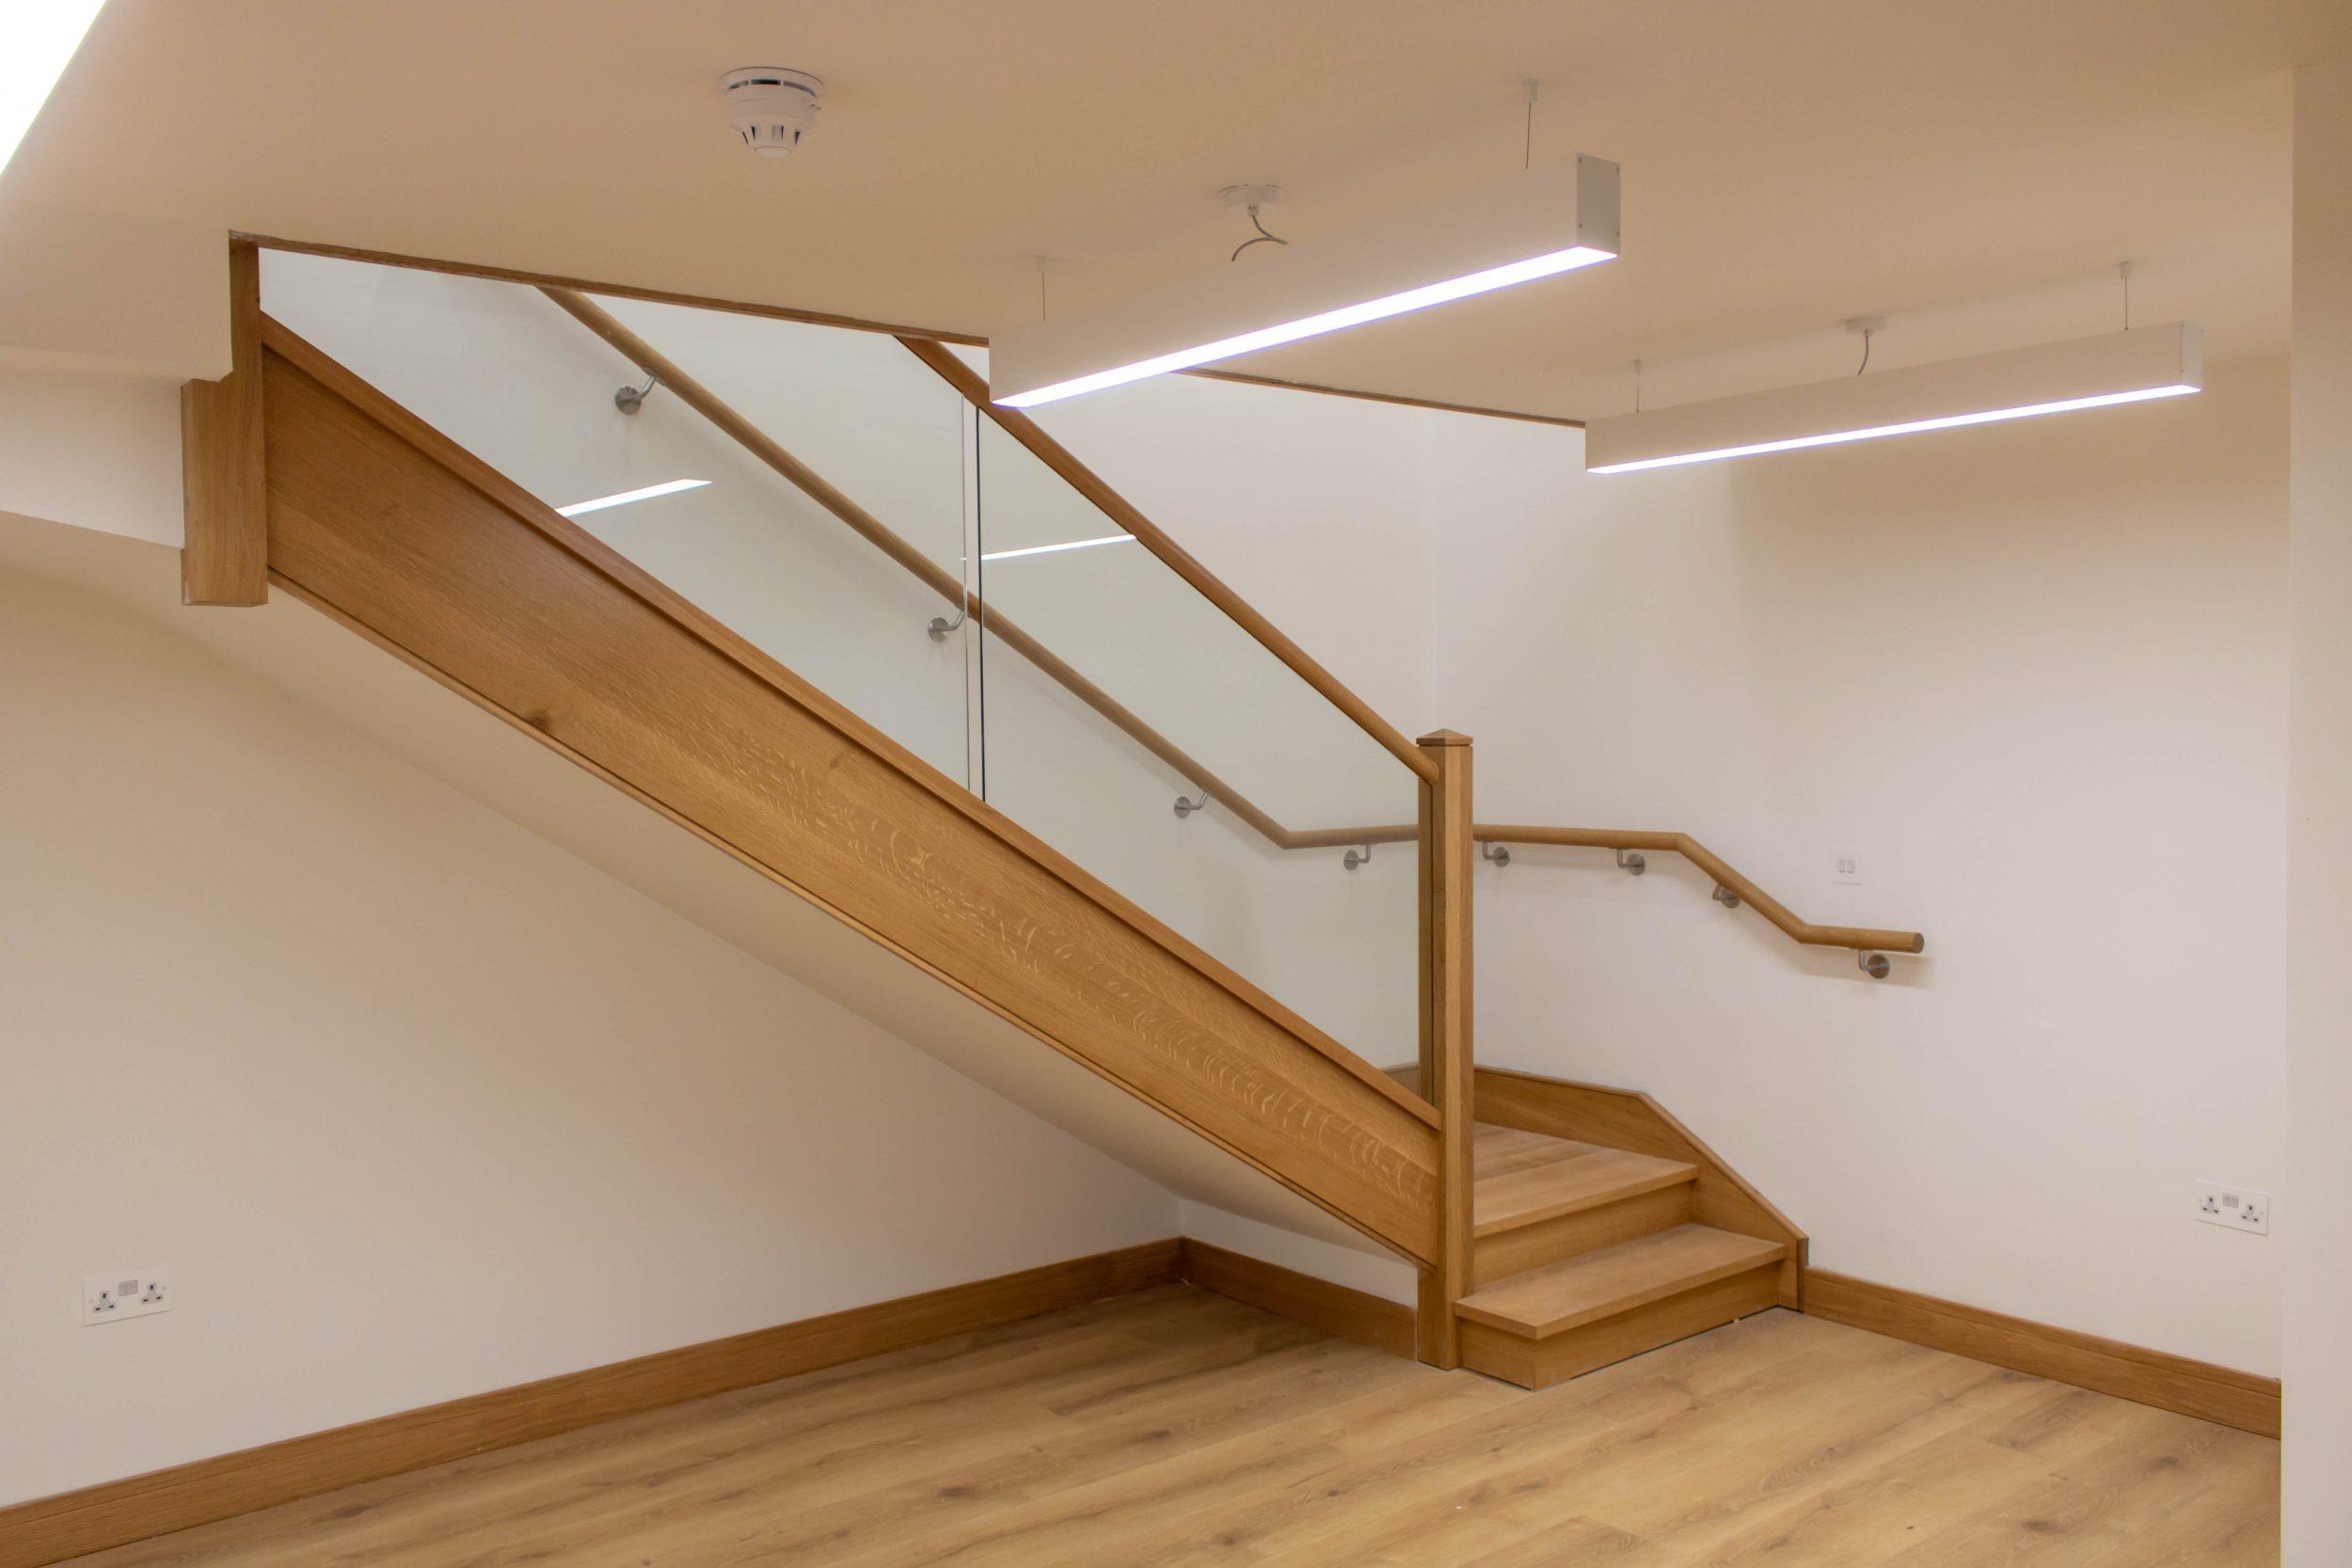 Kandd handrail stairs design